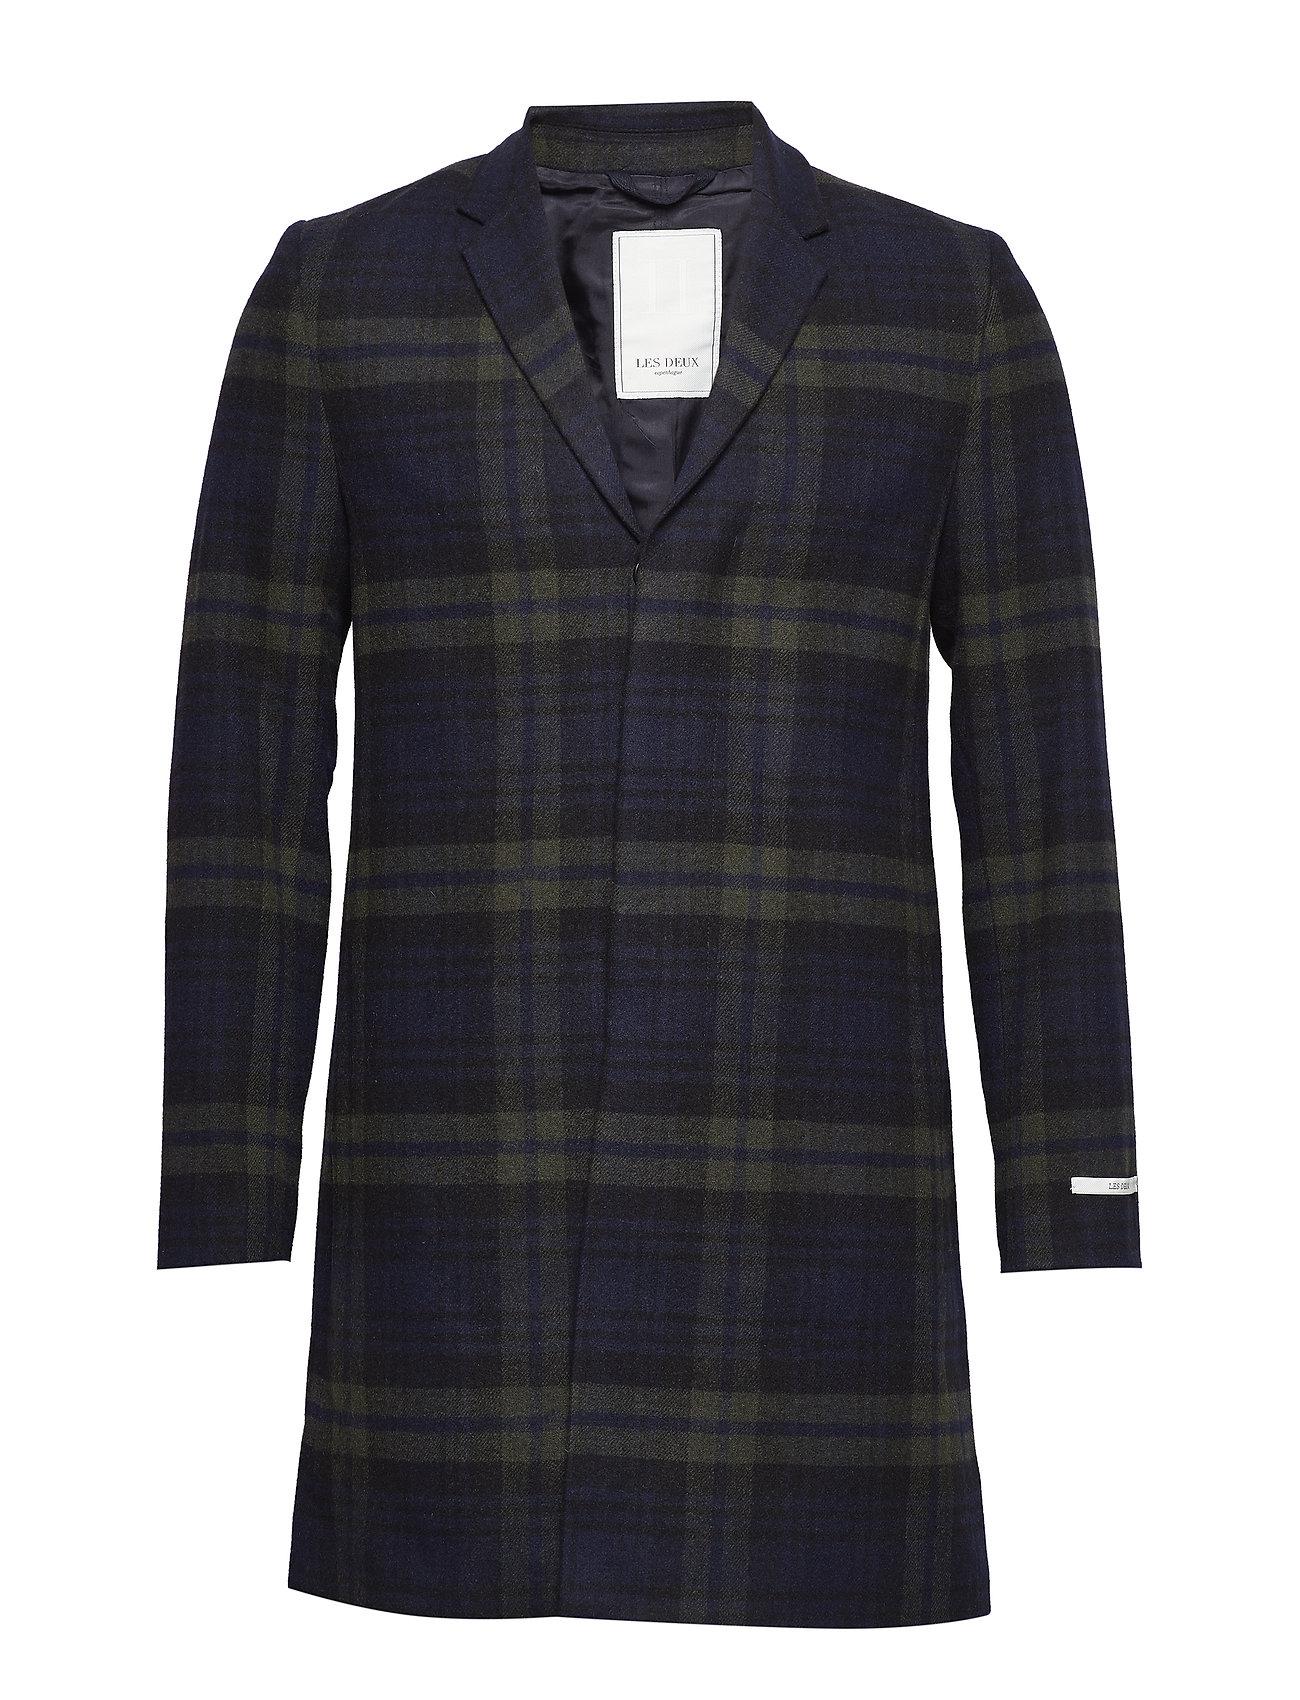 Les Deux Frielle Tailoröd Check Coat Ytterkläder